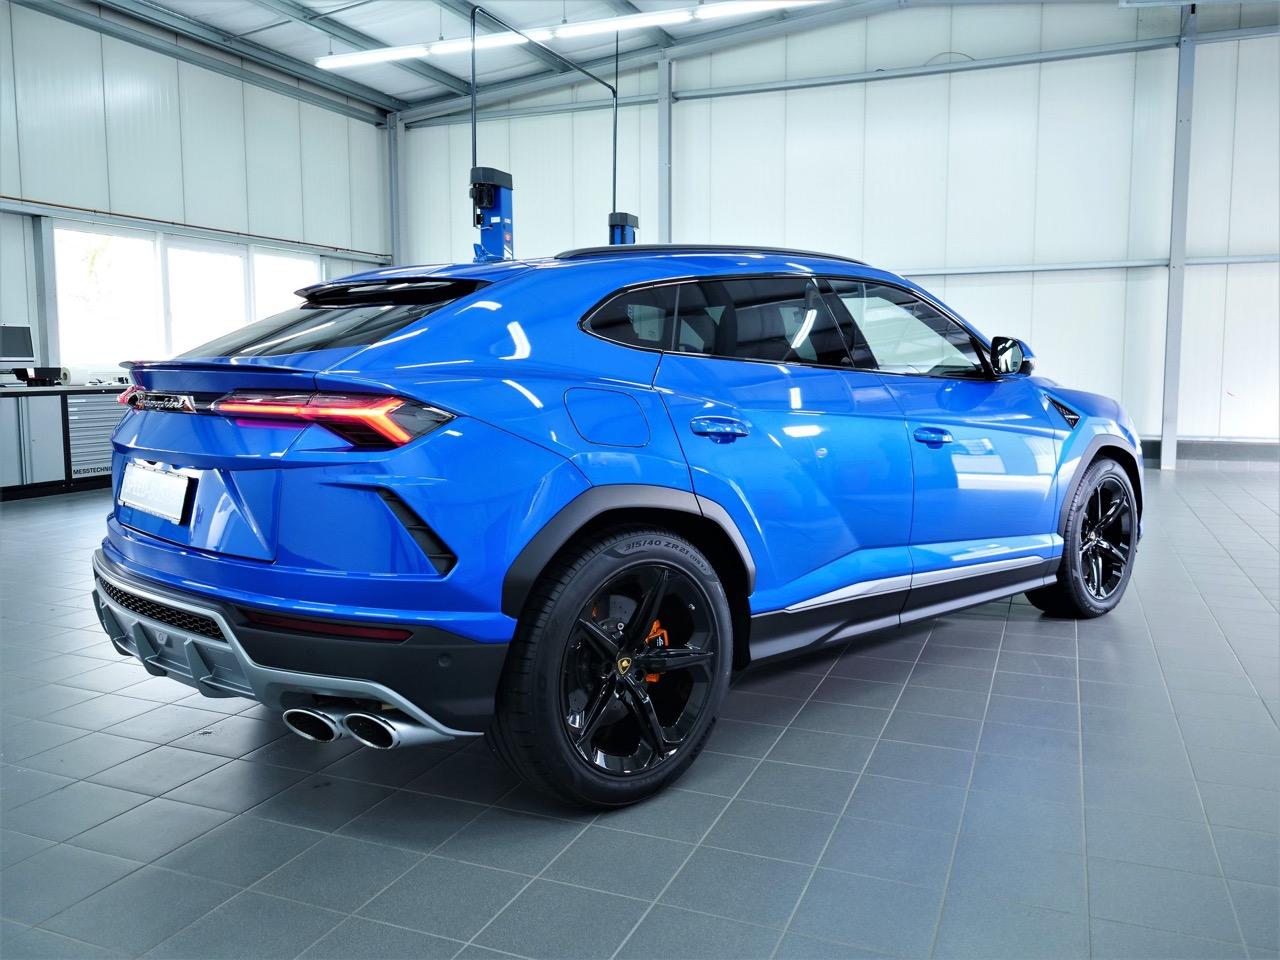 Lamborghini-Urus-Speed-Buster-3